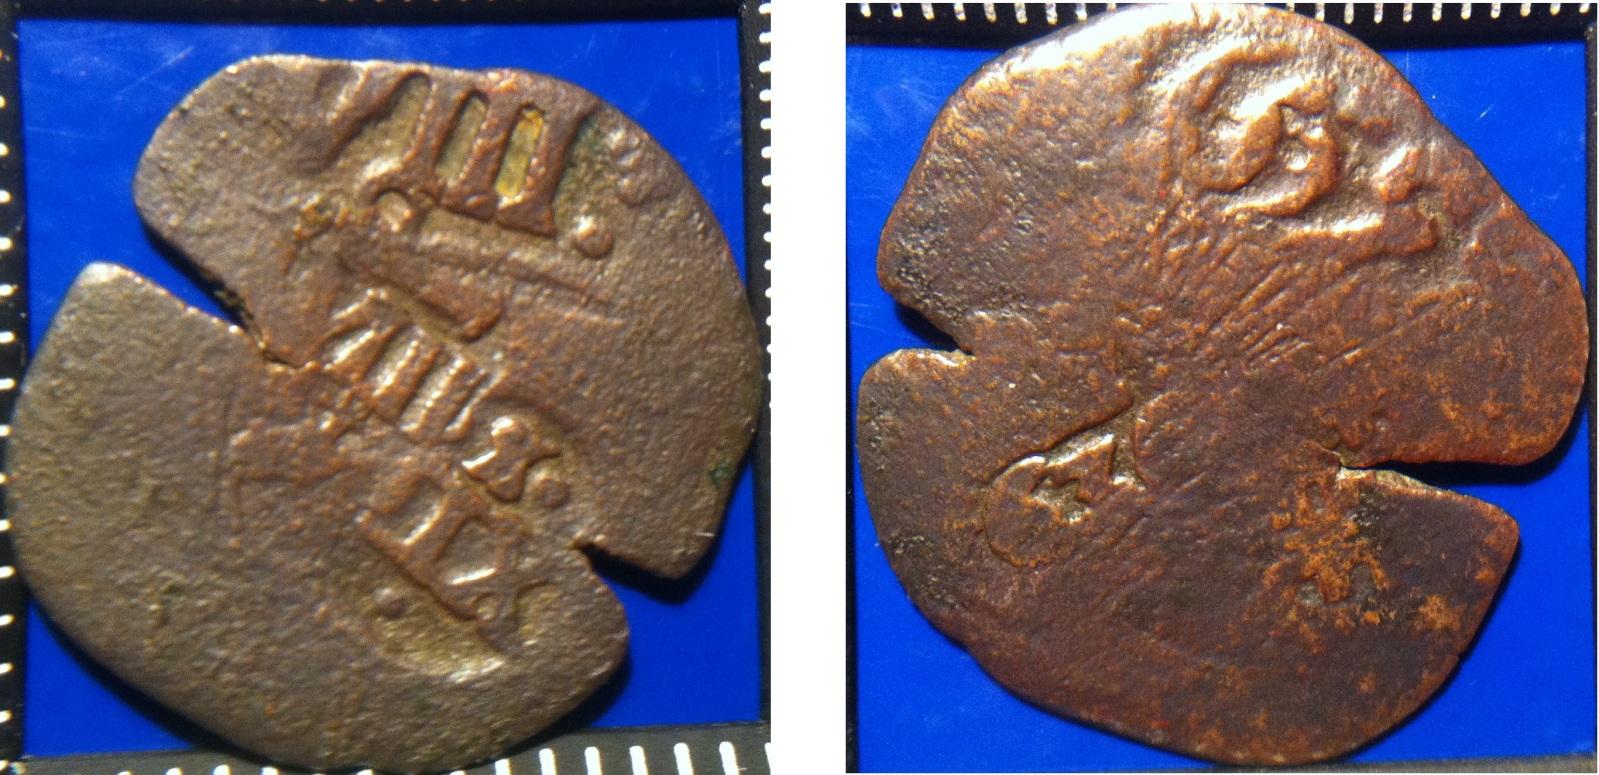 4 maravedís de Felipe II o a nombre de los RRCC resellado a VIII maravedís de 1603 resellado a XII maravedís de 1636, resellado a VIII maravedís de 1655 2zz3ps9